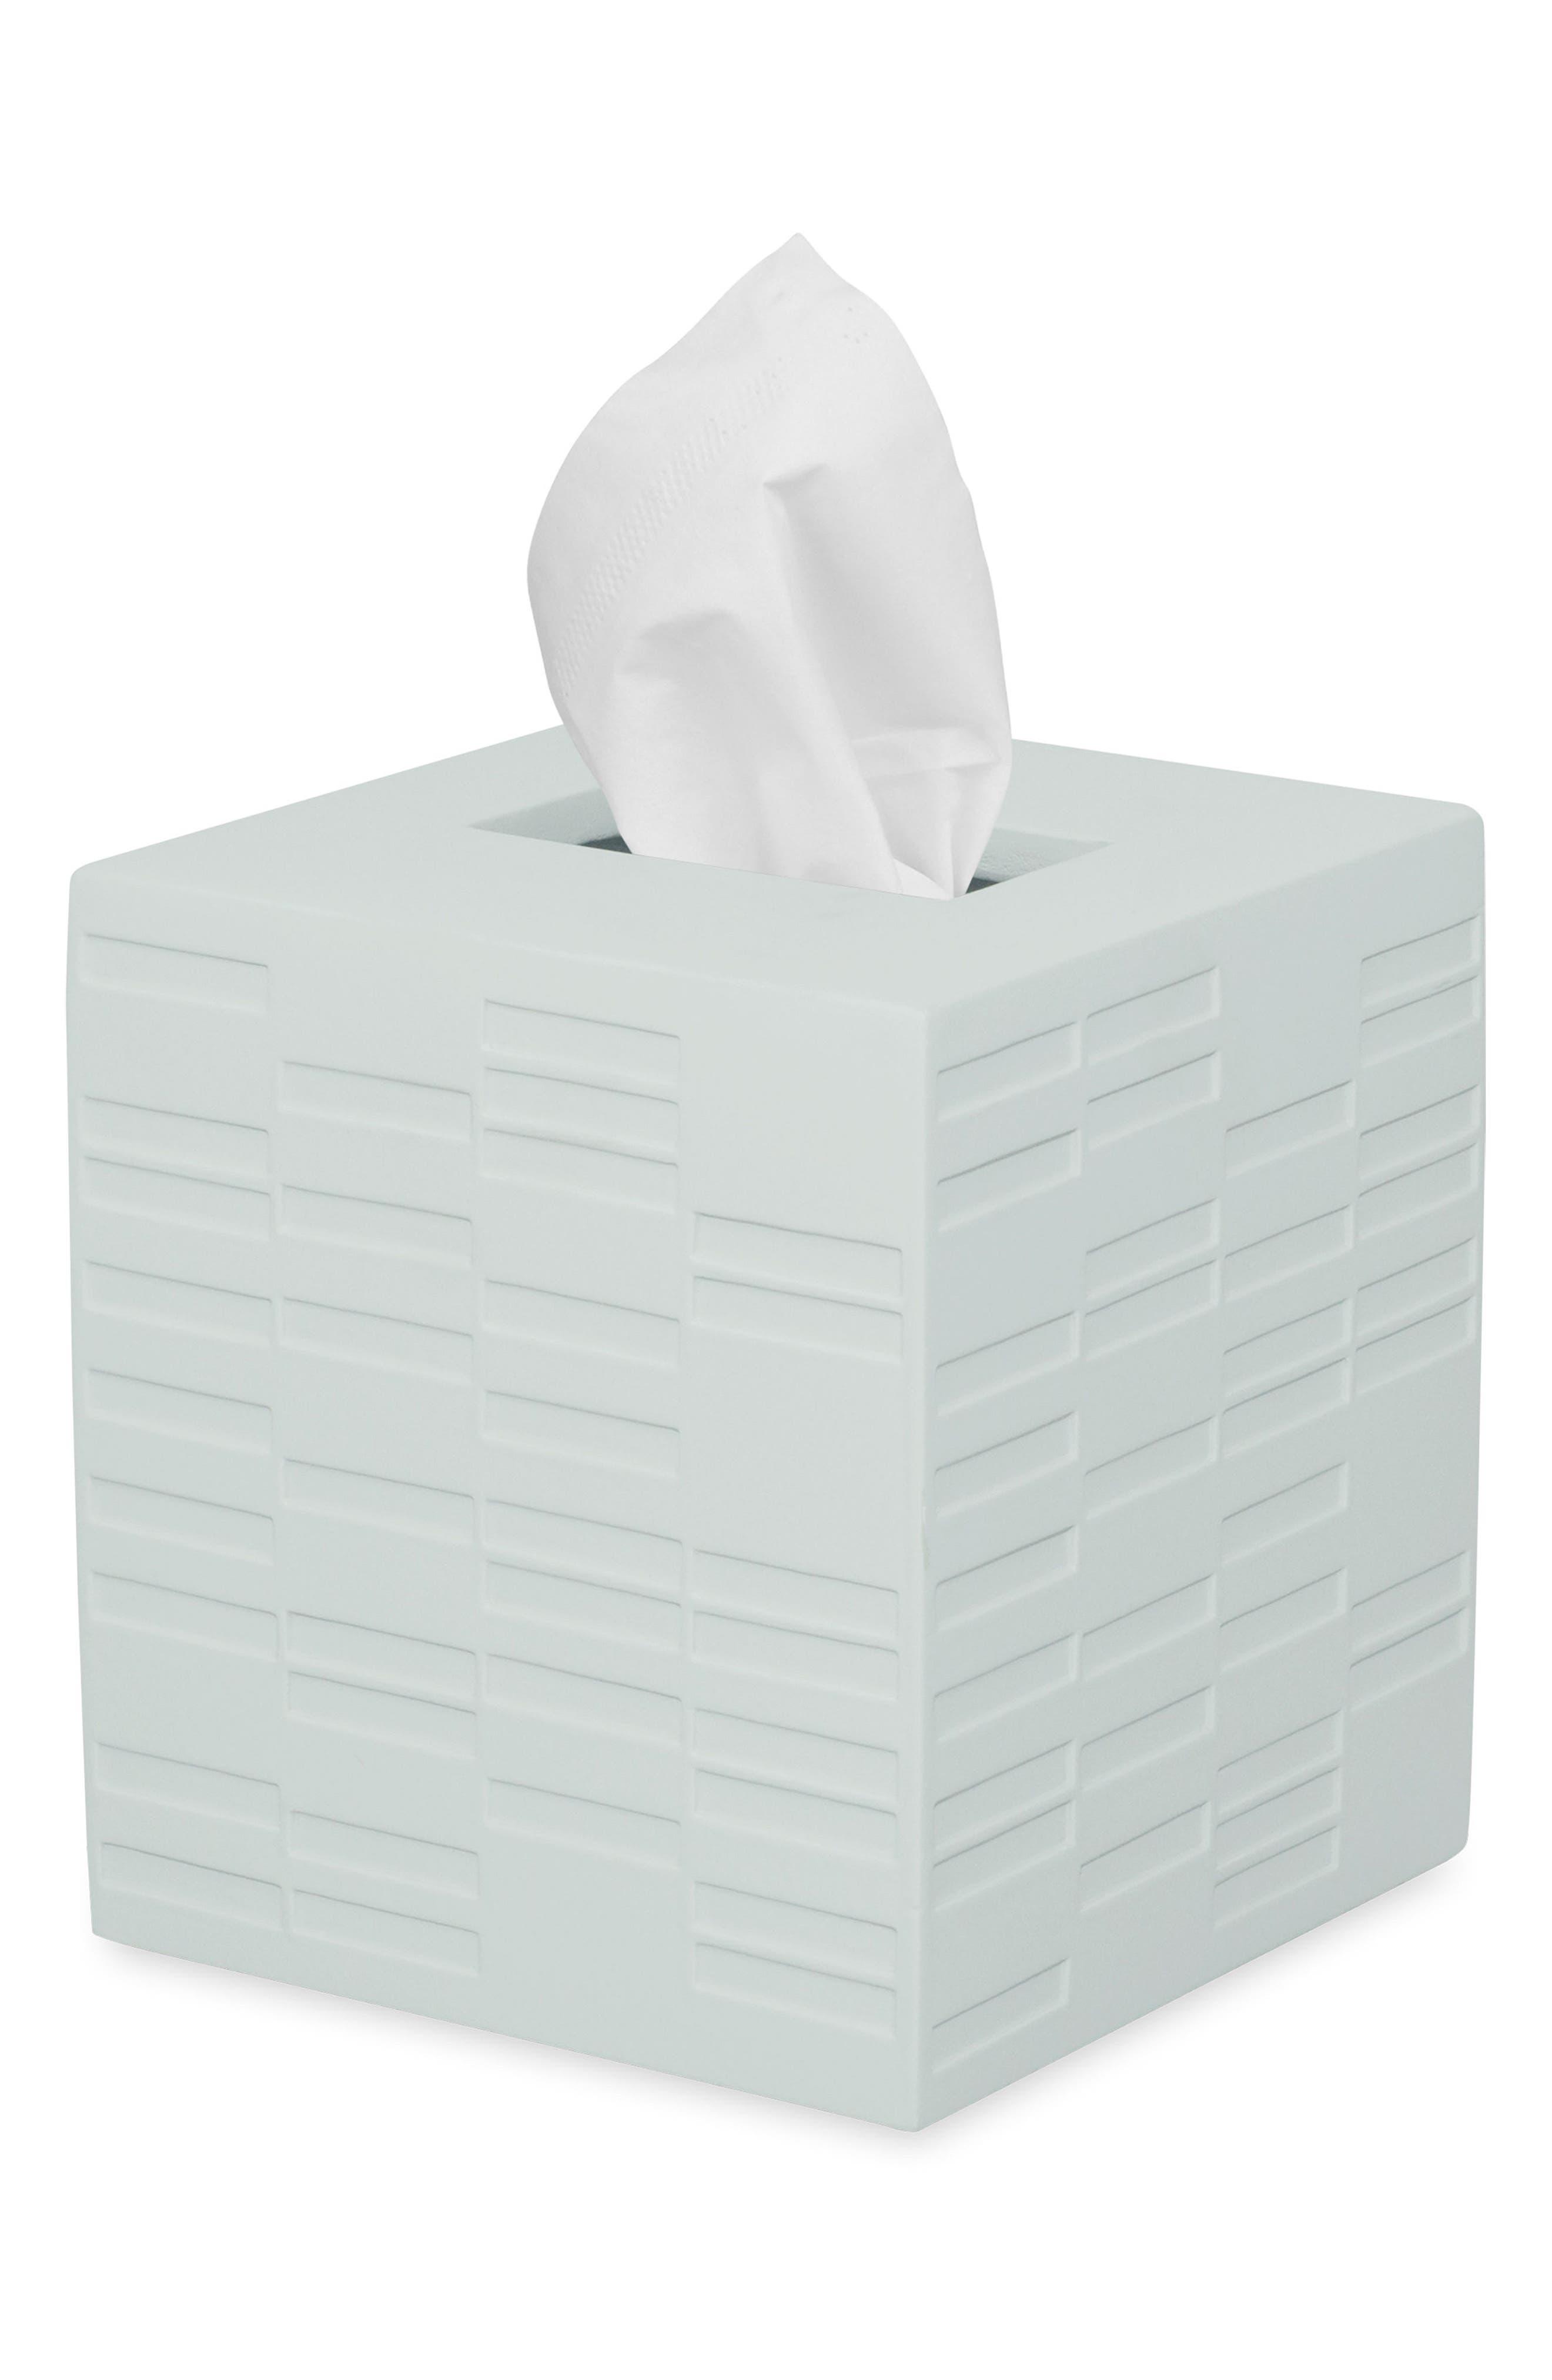 DKNY High Rise Tissue Box Cover